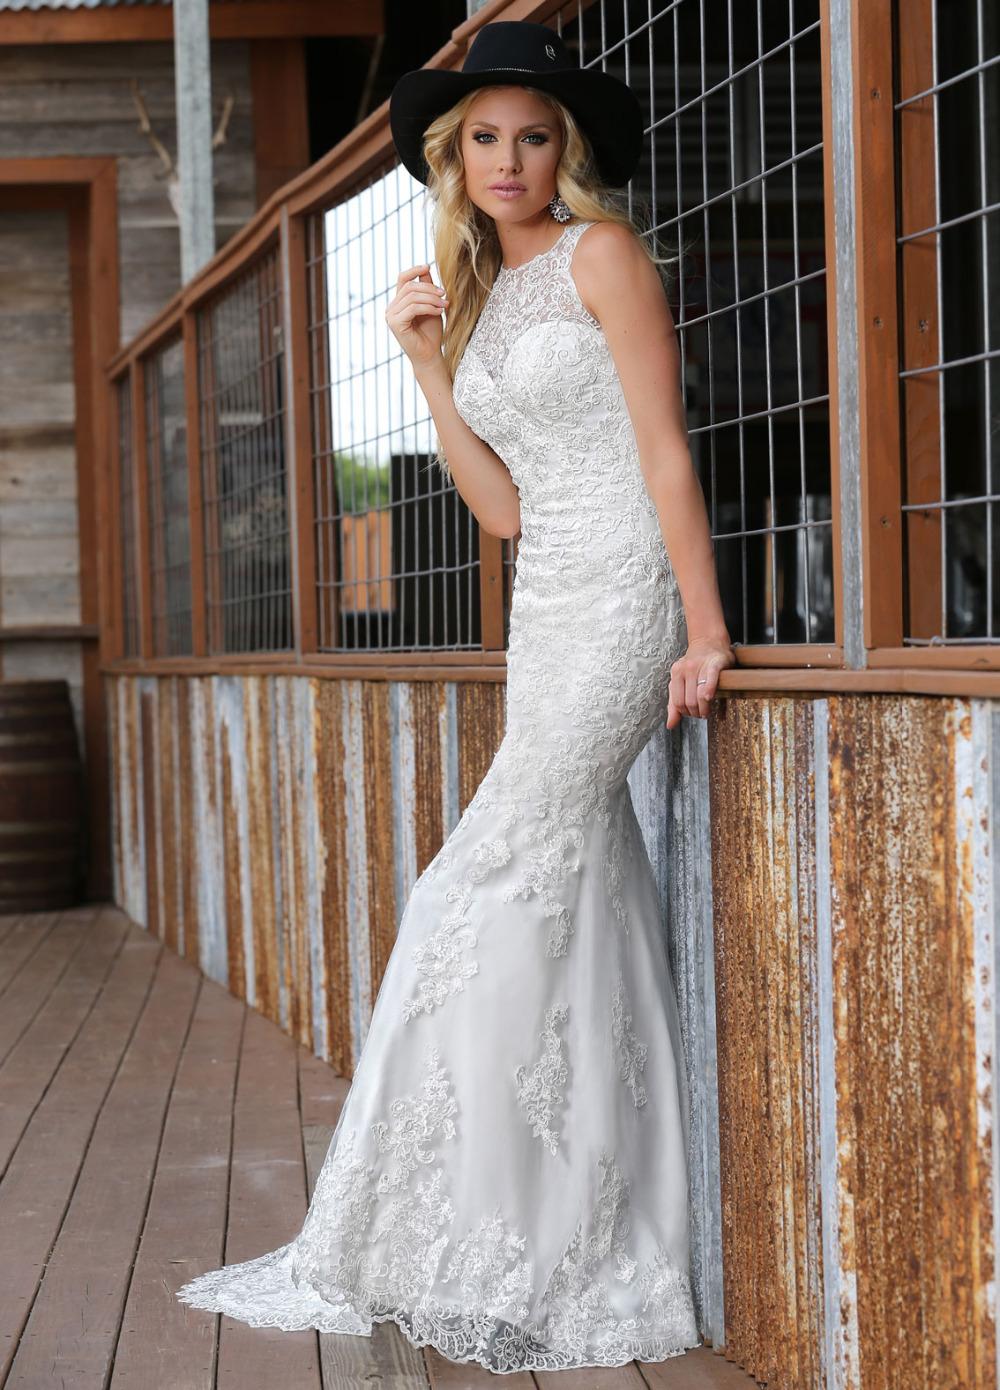 Wedding Dress Lace Italian : Italian lace wedding dresses buy wholesale